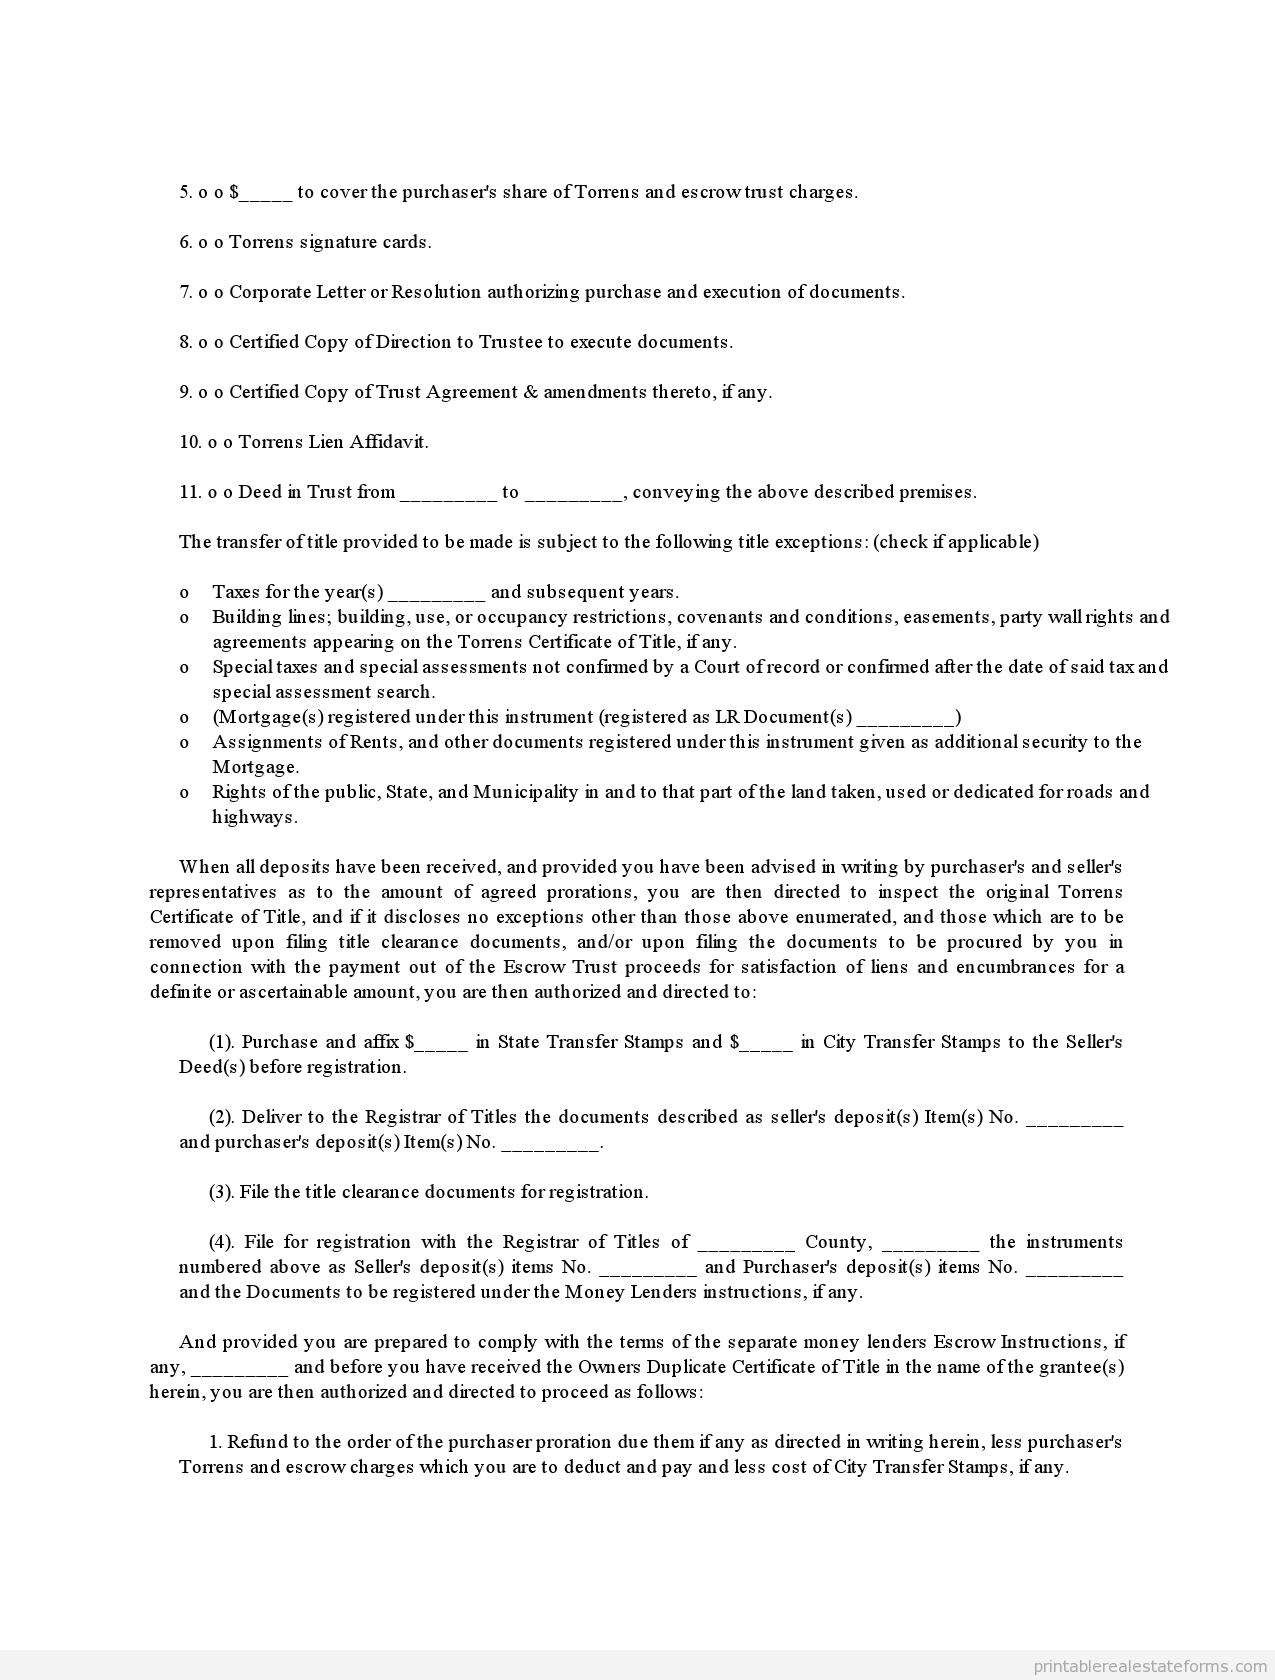 Printable Sample Torrens Title 2 Form Printable Template Legal